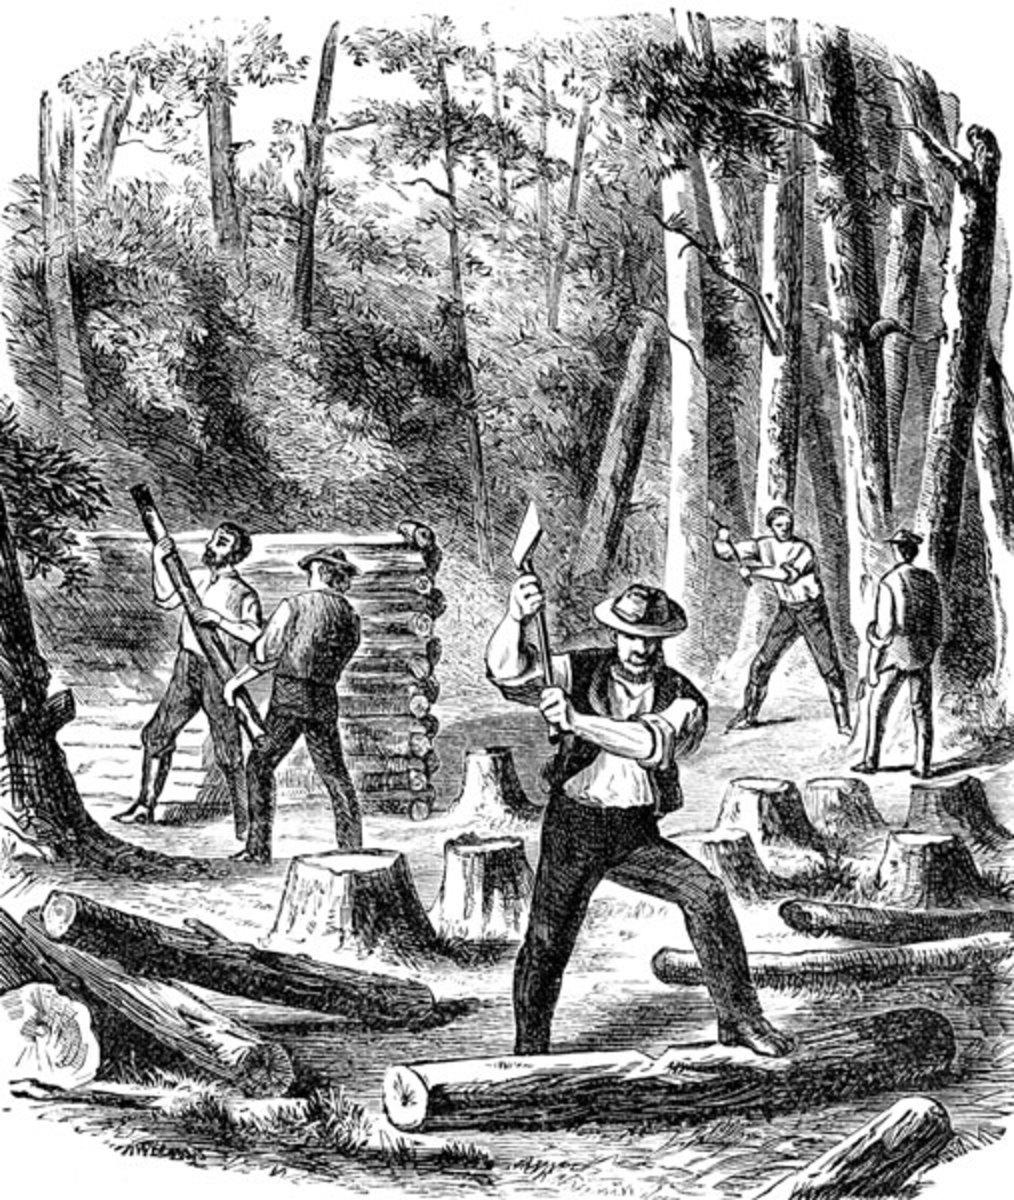 The Founding of Jamestown